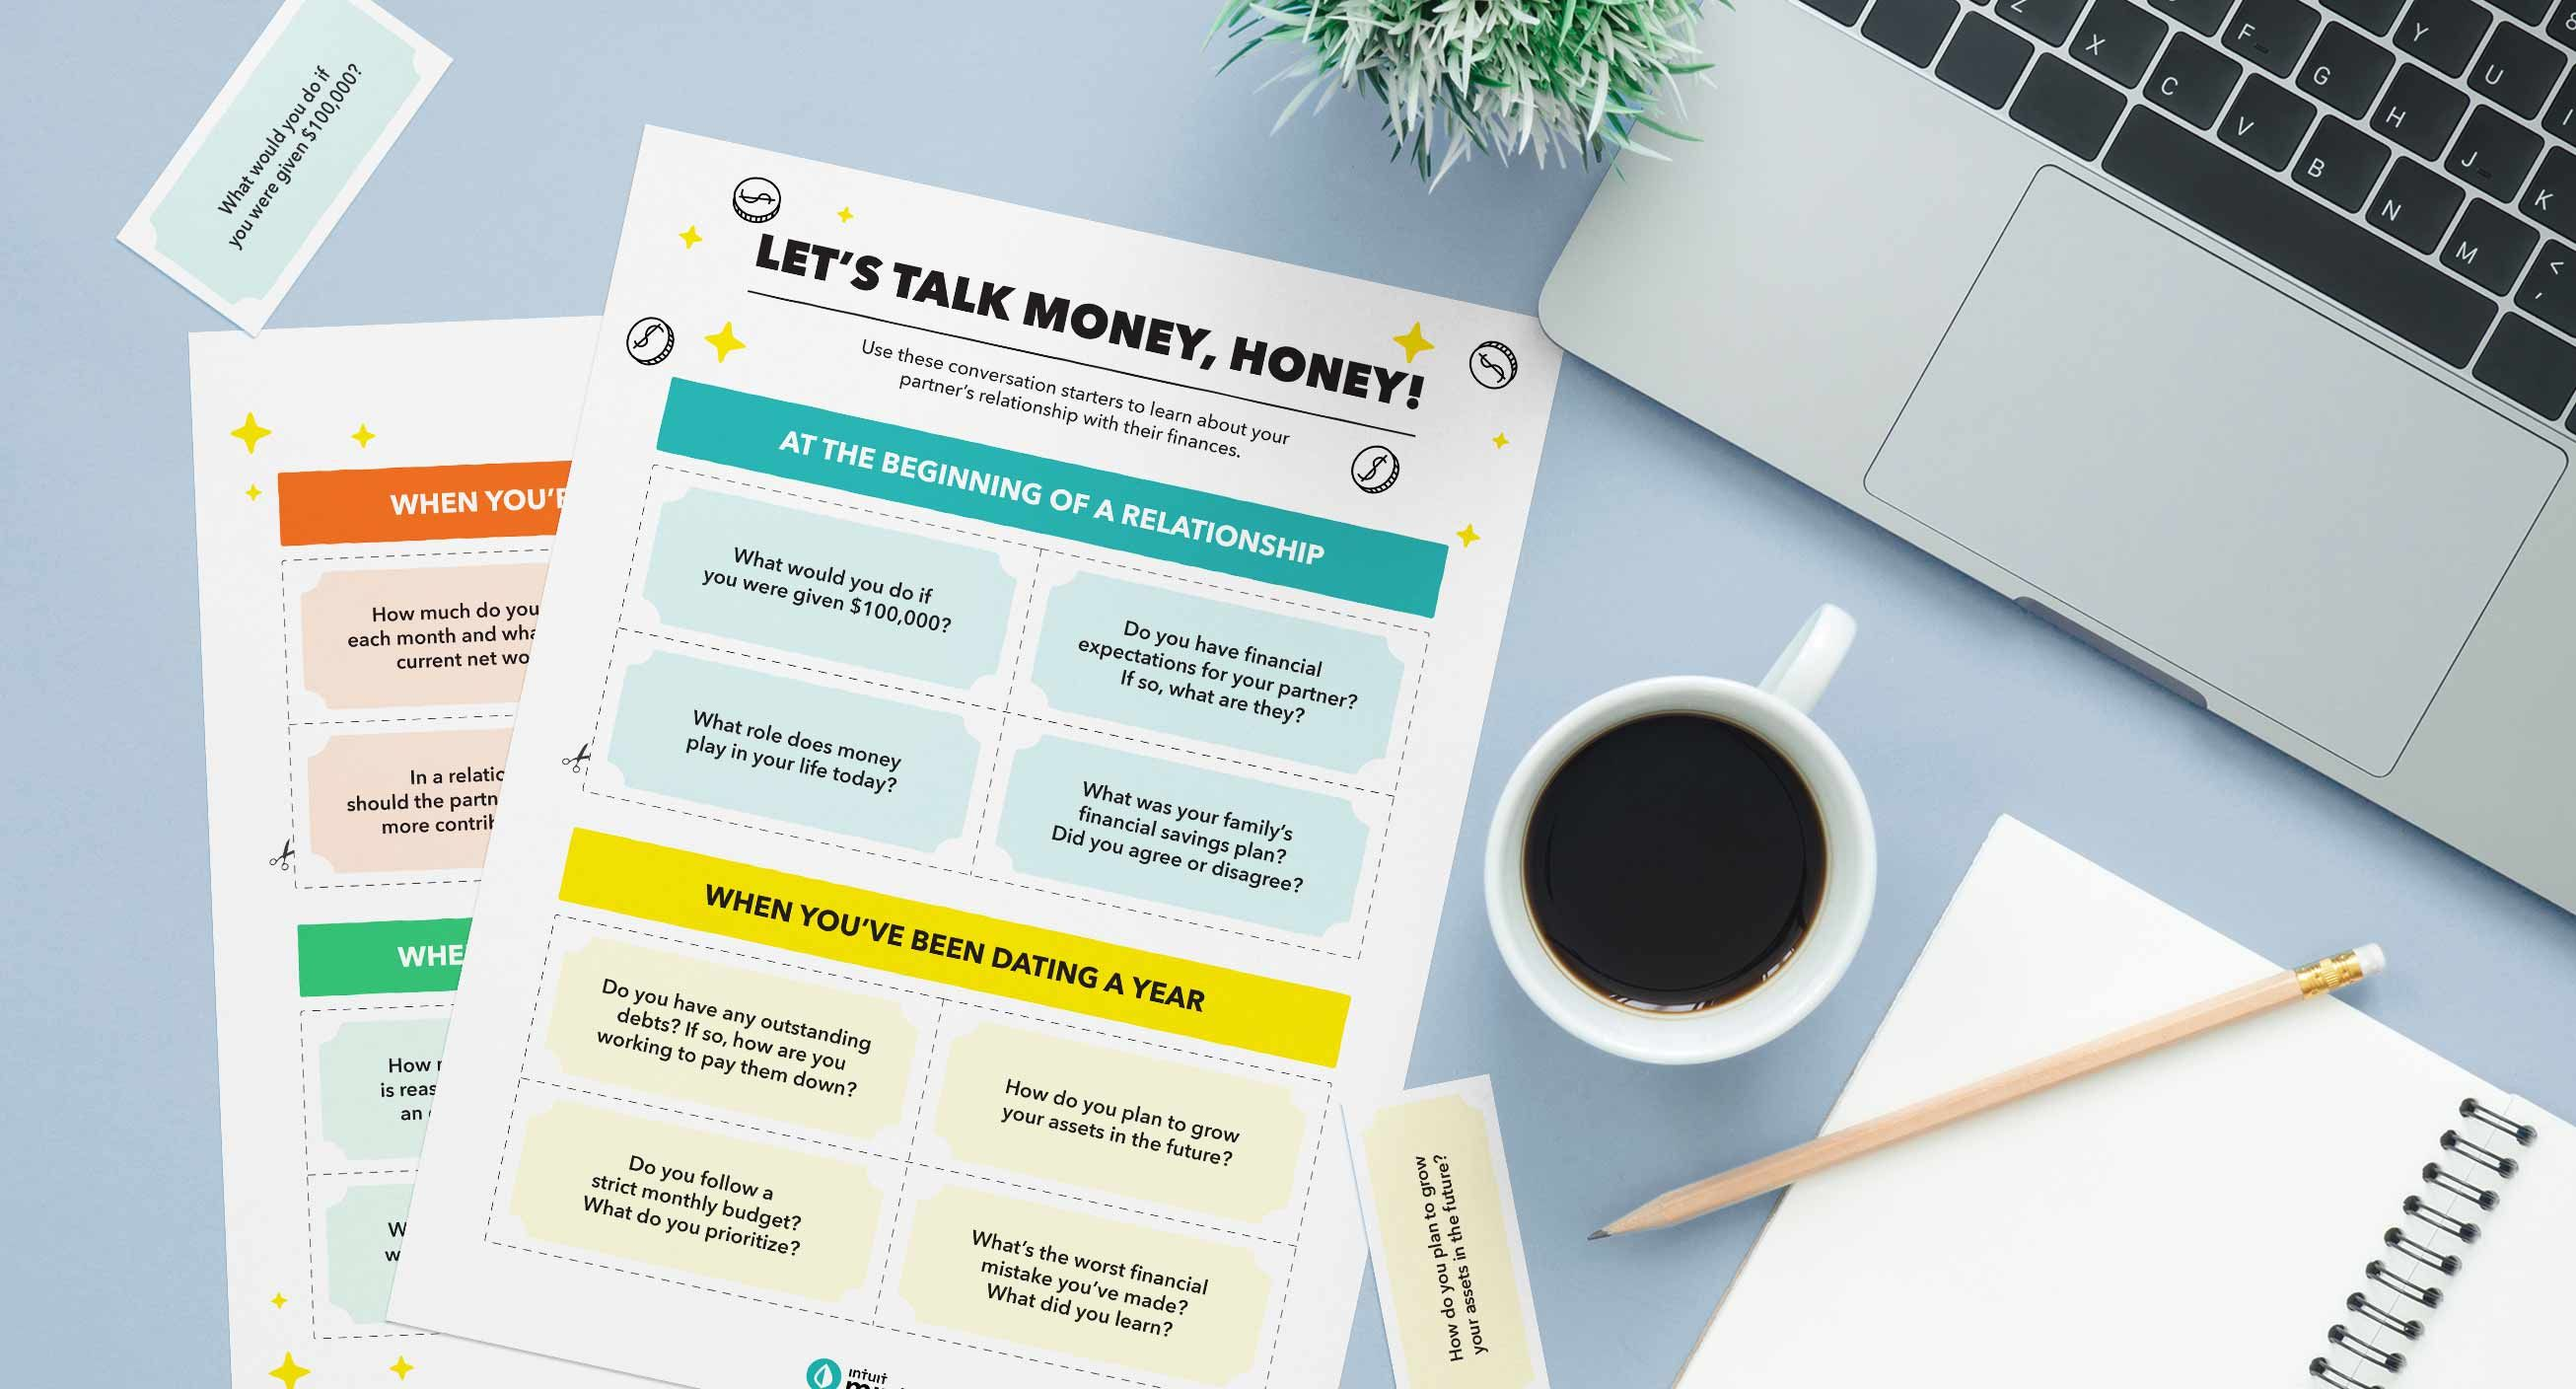 Let's Talk Money, Honey! Mockup